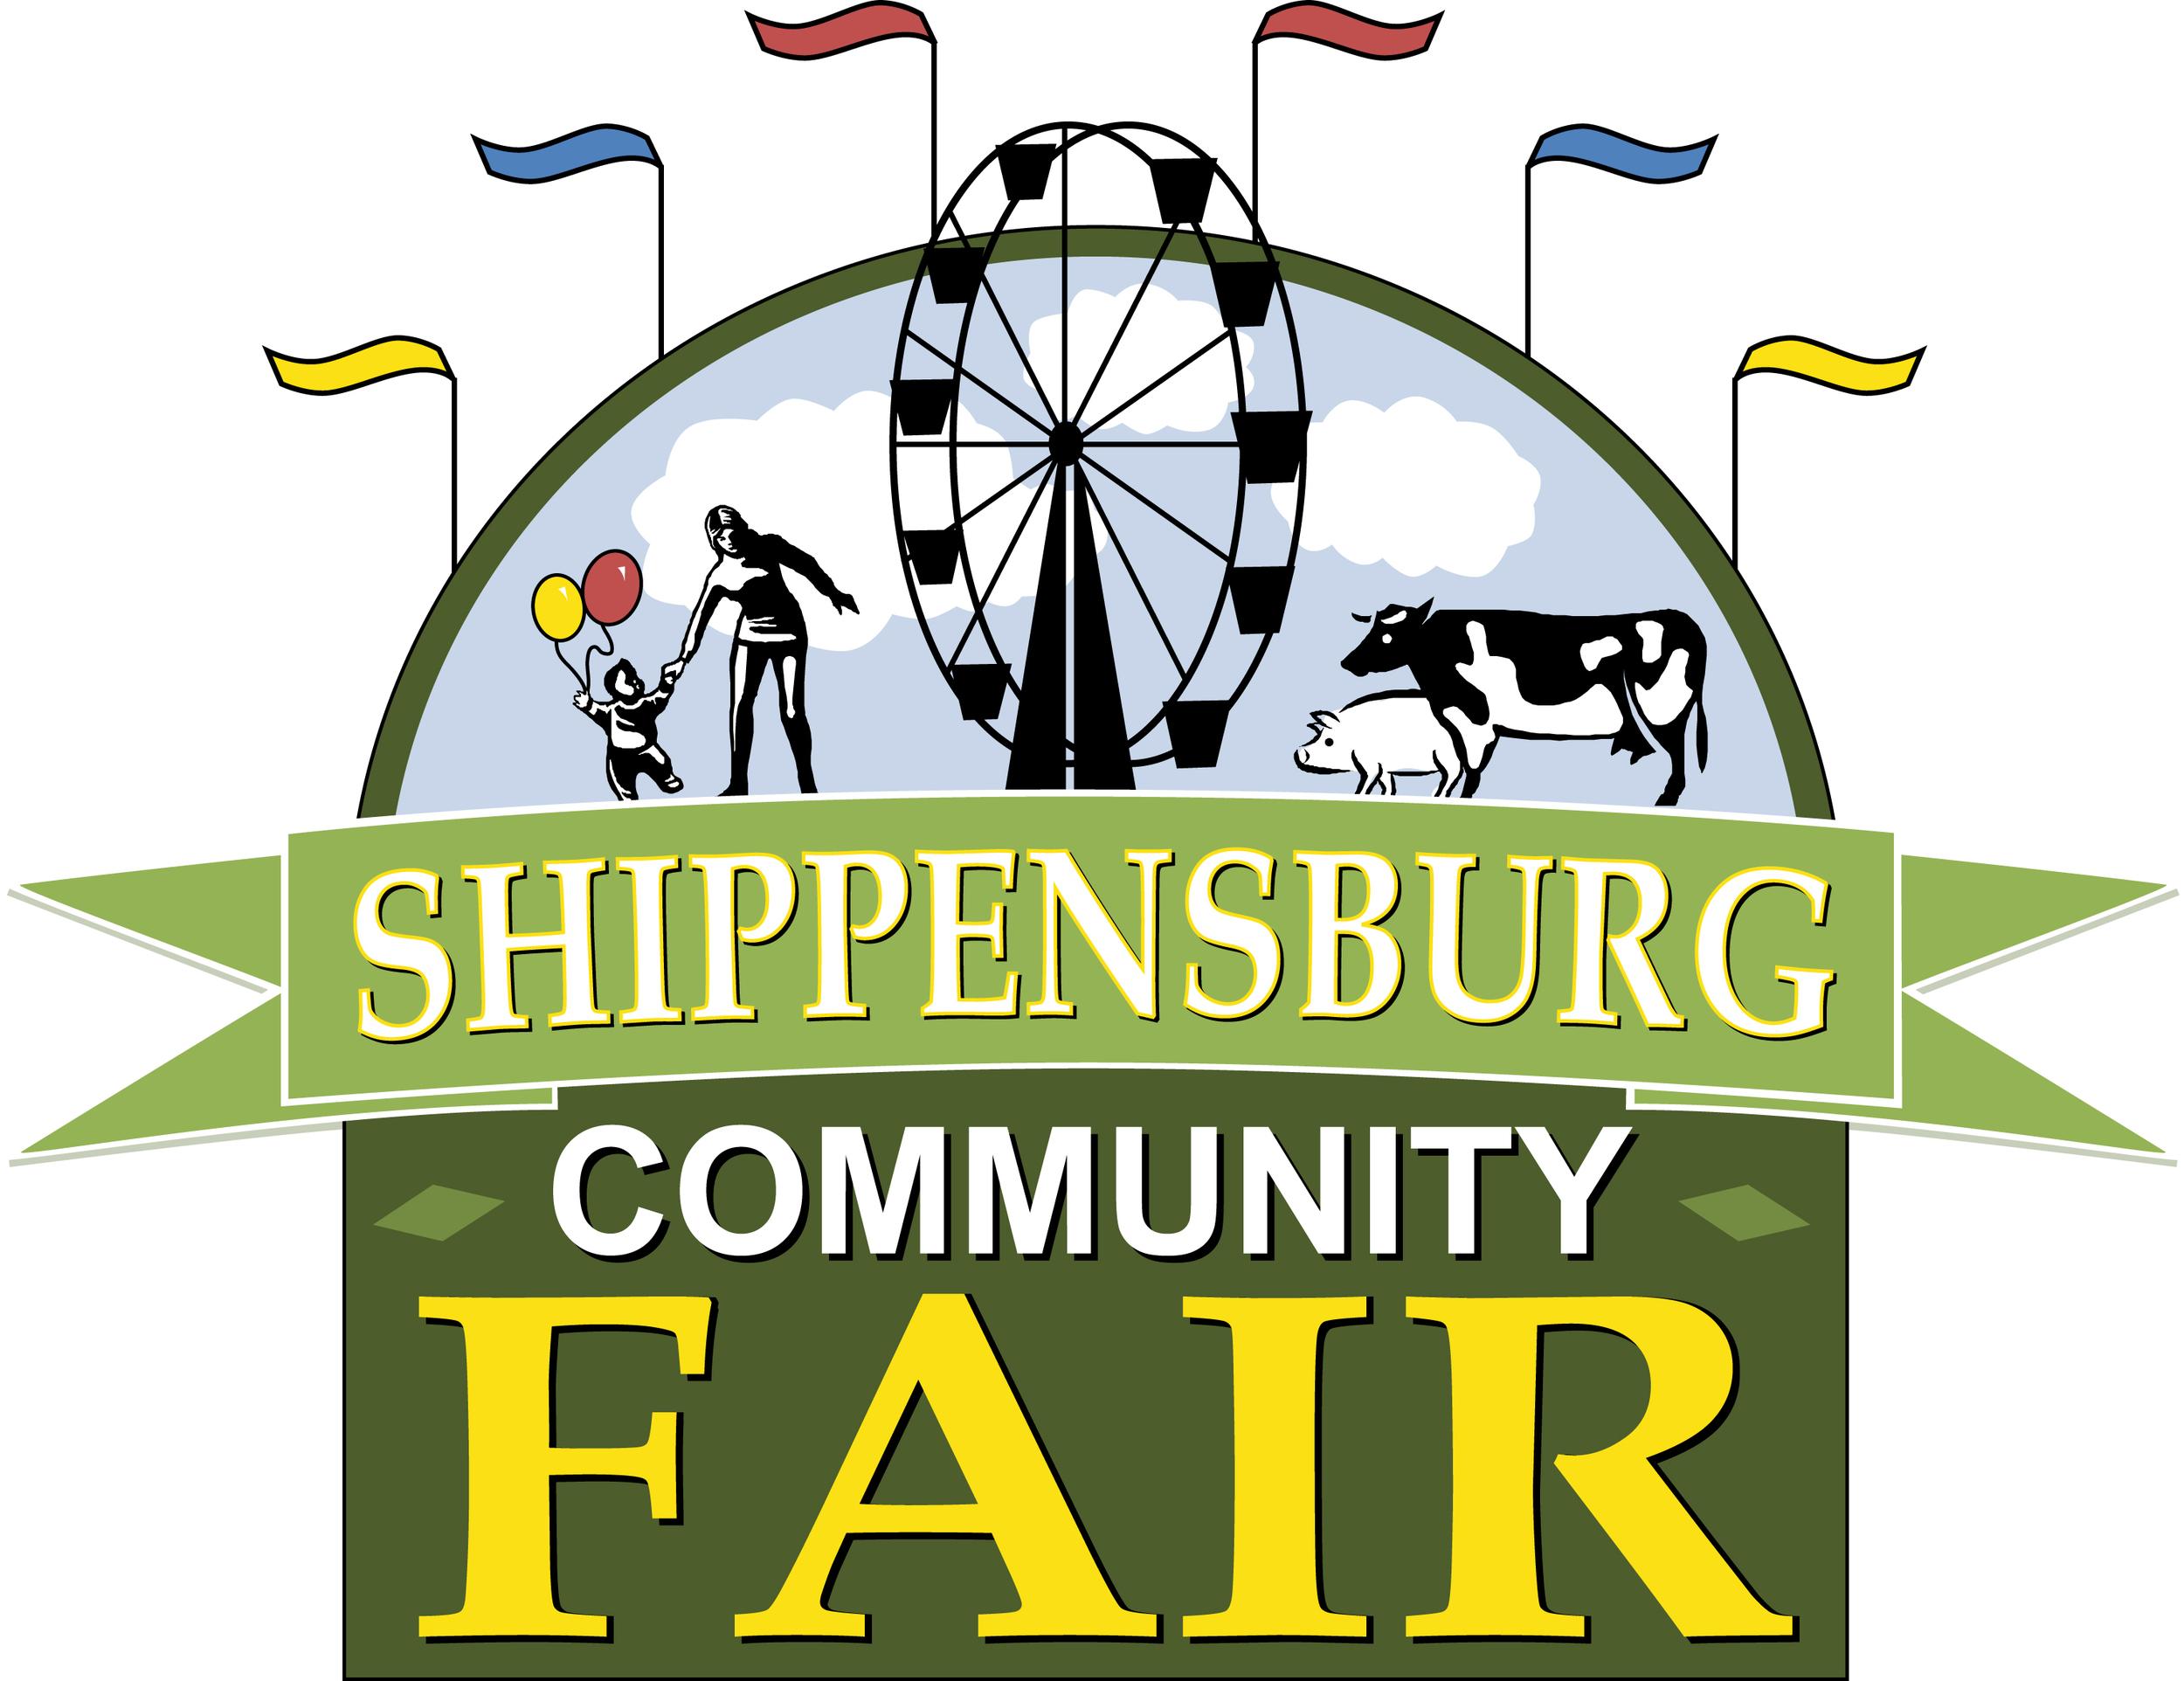 Shippensburg Community Fair Official Logo   High Resolution (JPEG) - 1.58 MB